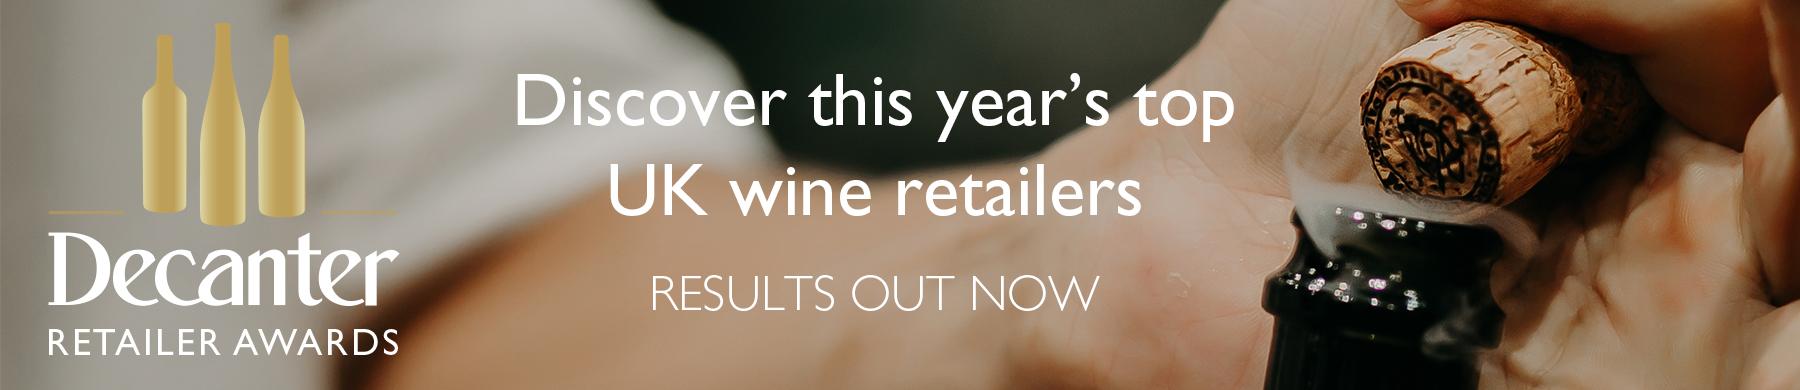 Decanter Retailer Awards 2019 winners announced